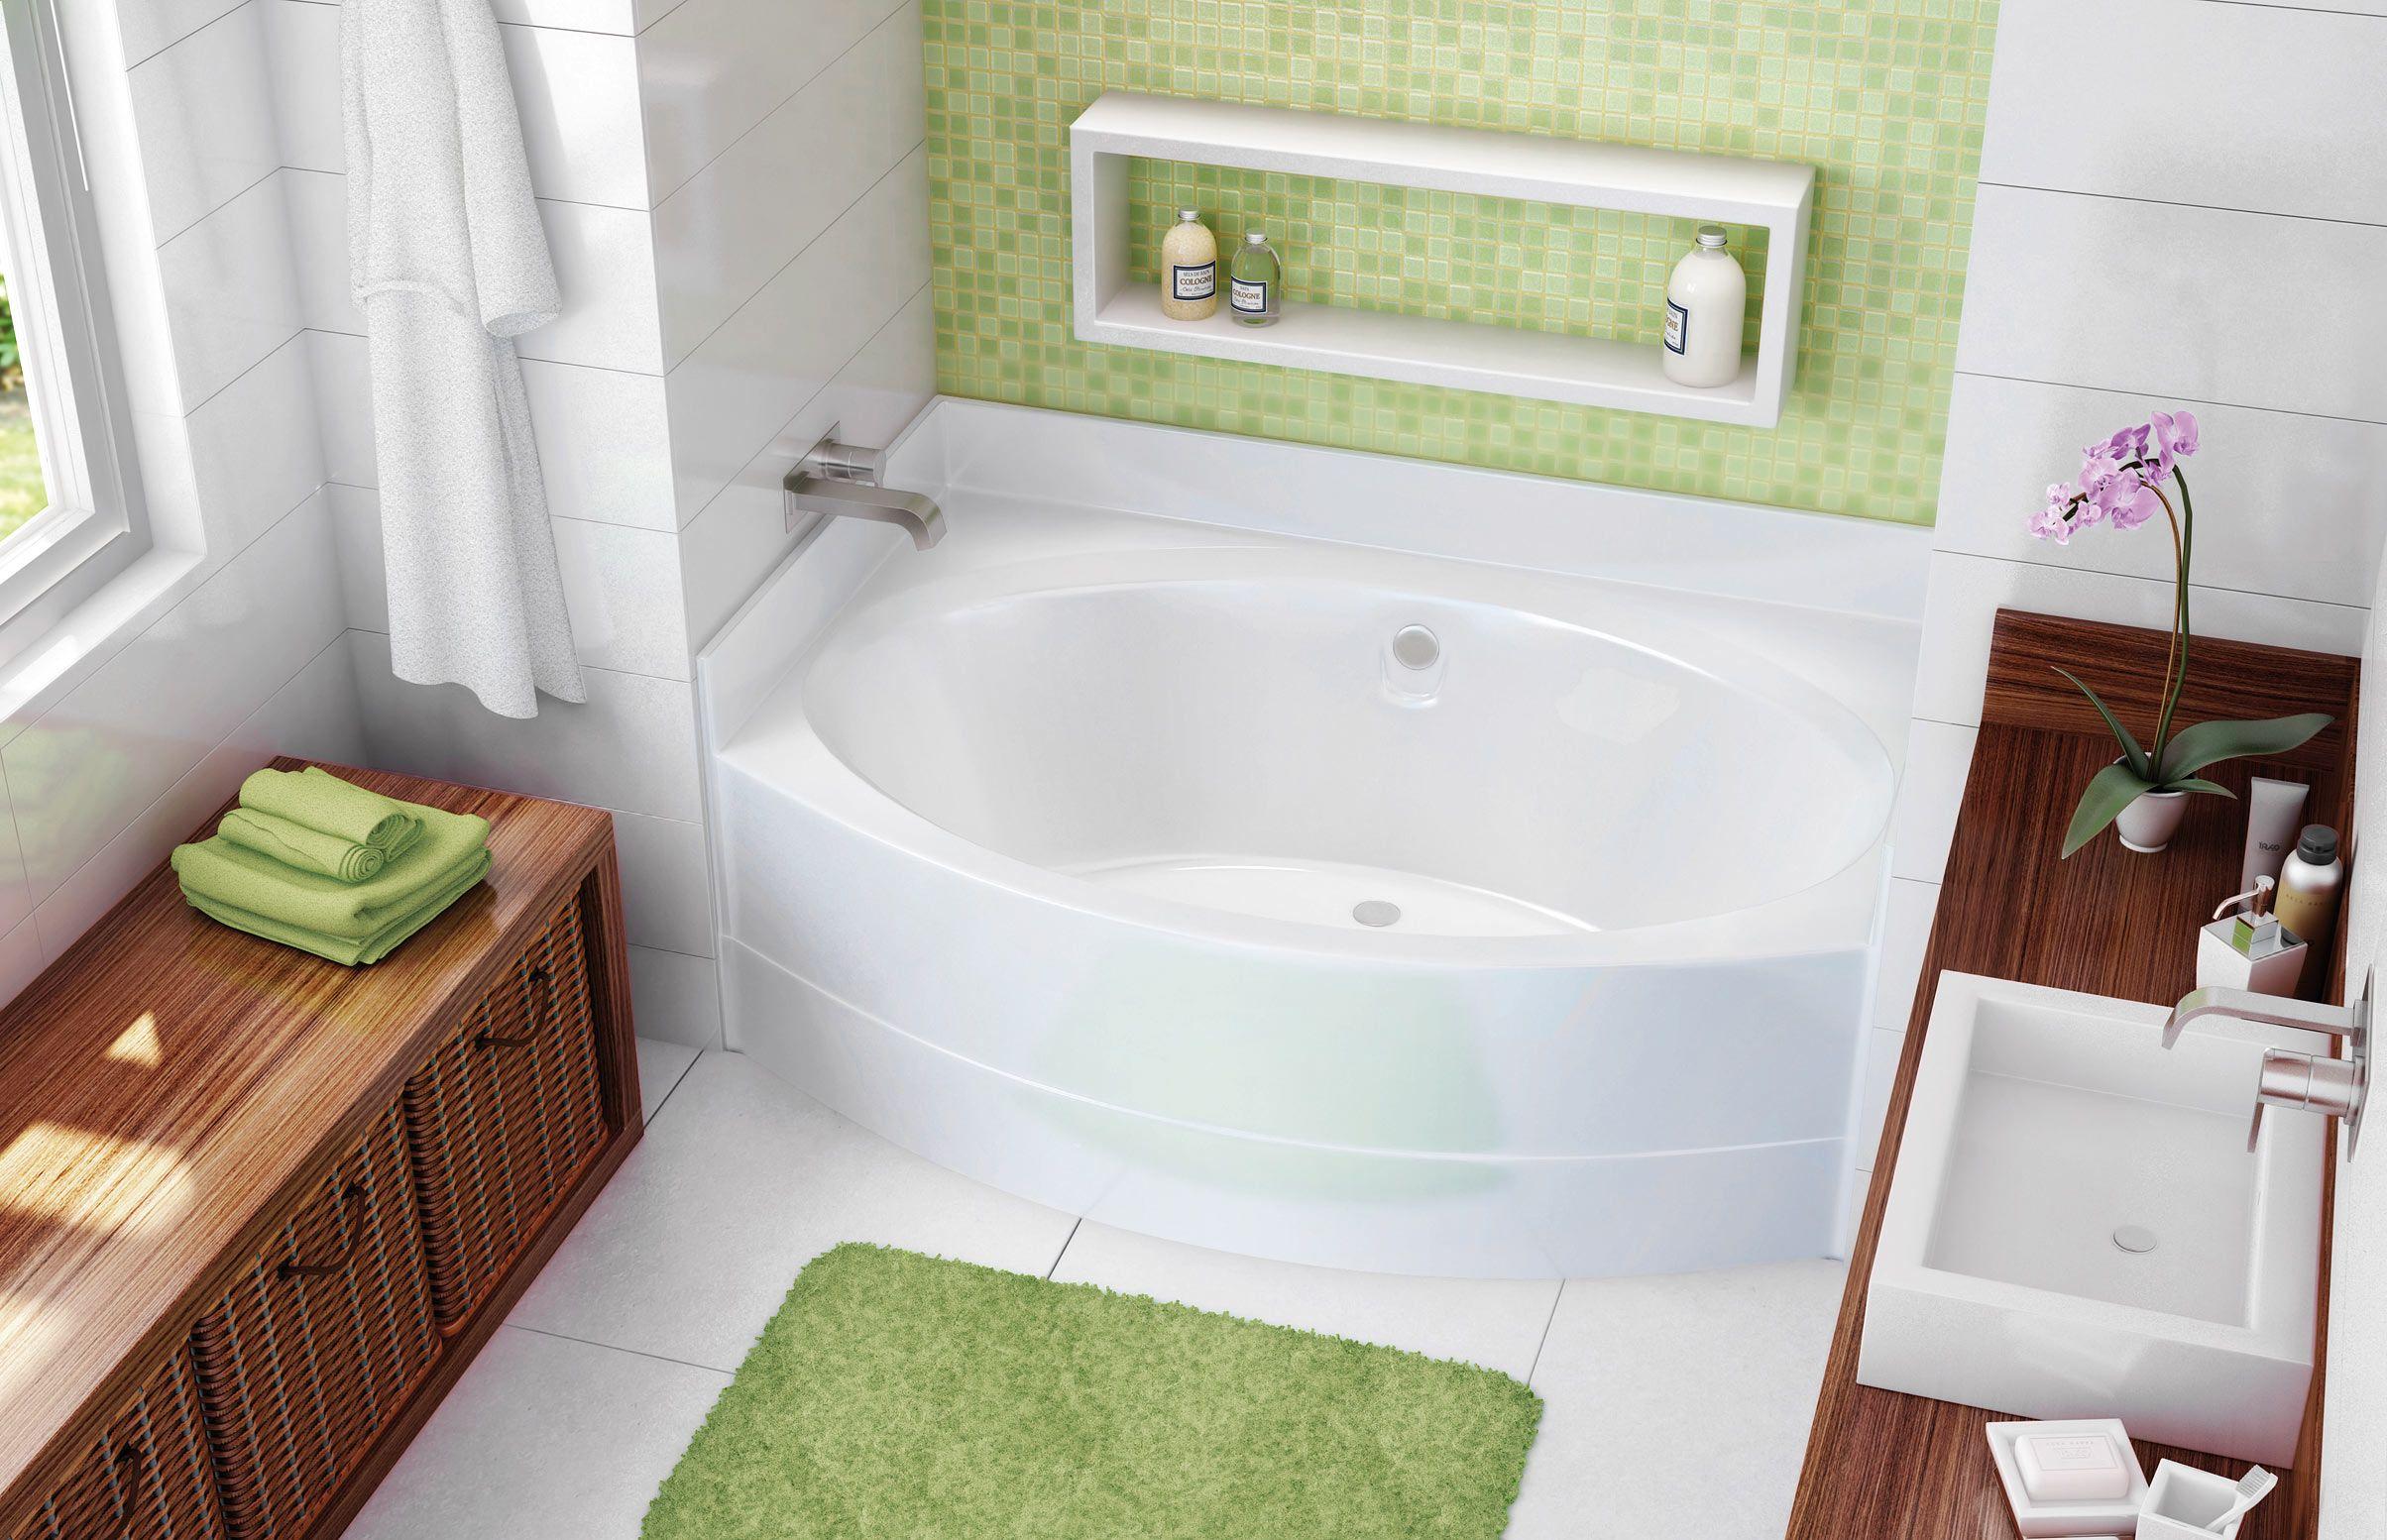 VO6042 Alcove bathtub - MAAX Professional | Geek that I love ...